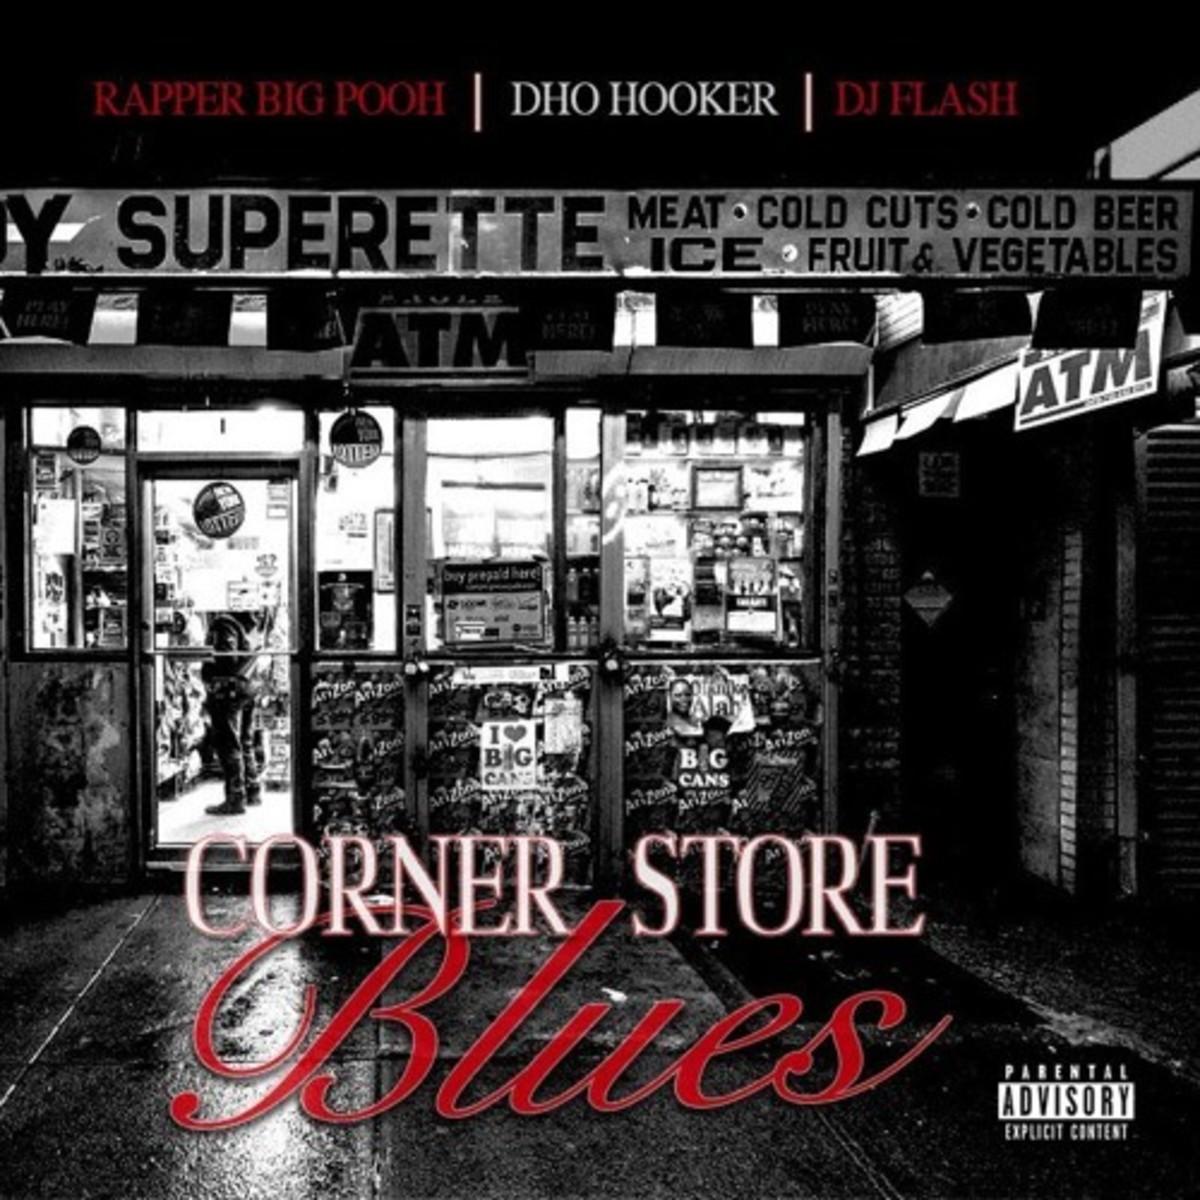 rapper-big-pooh-corner-store-blues.jpg